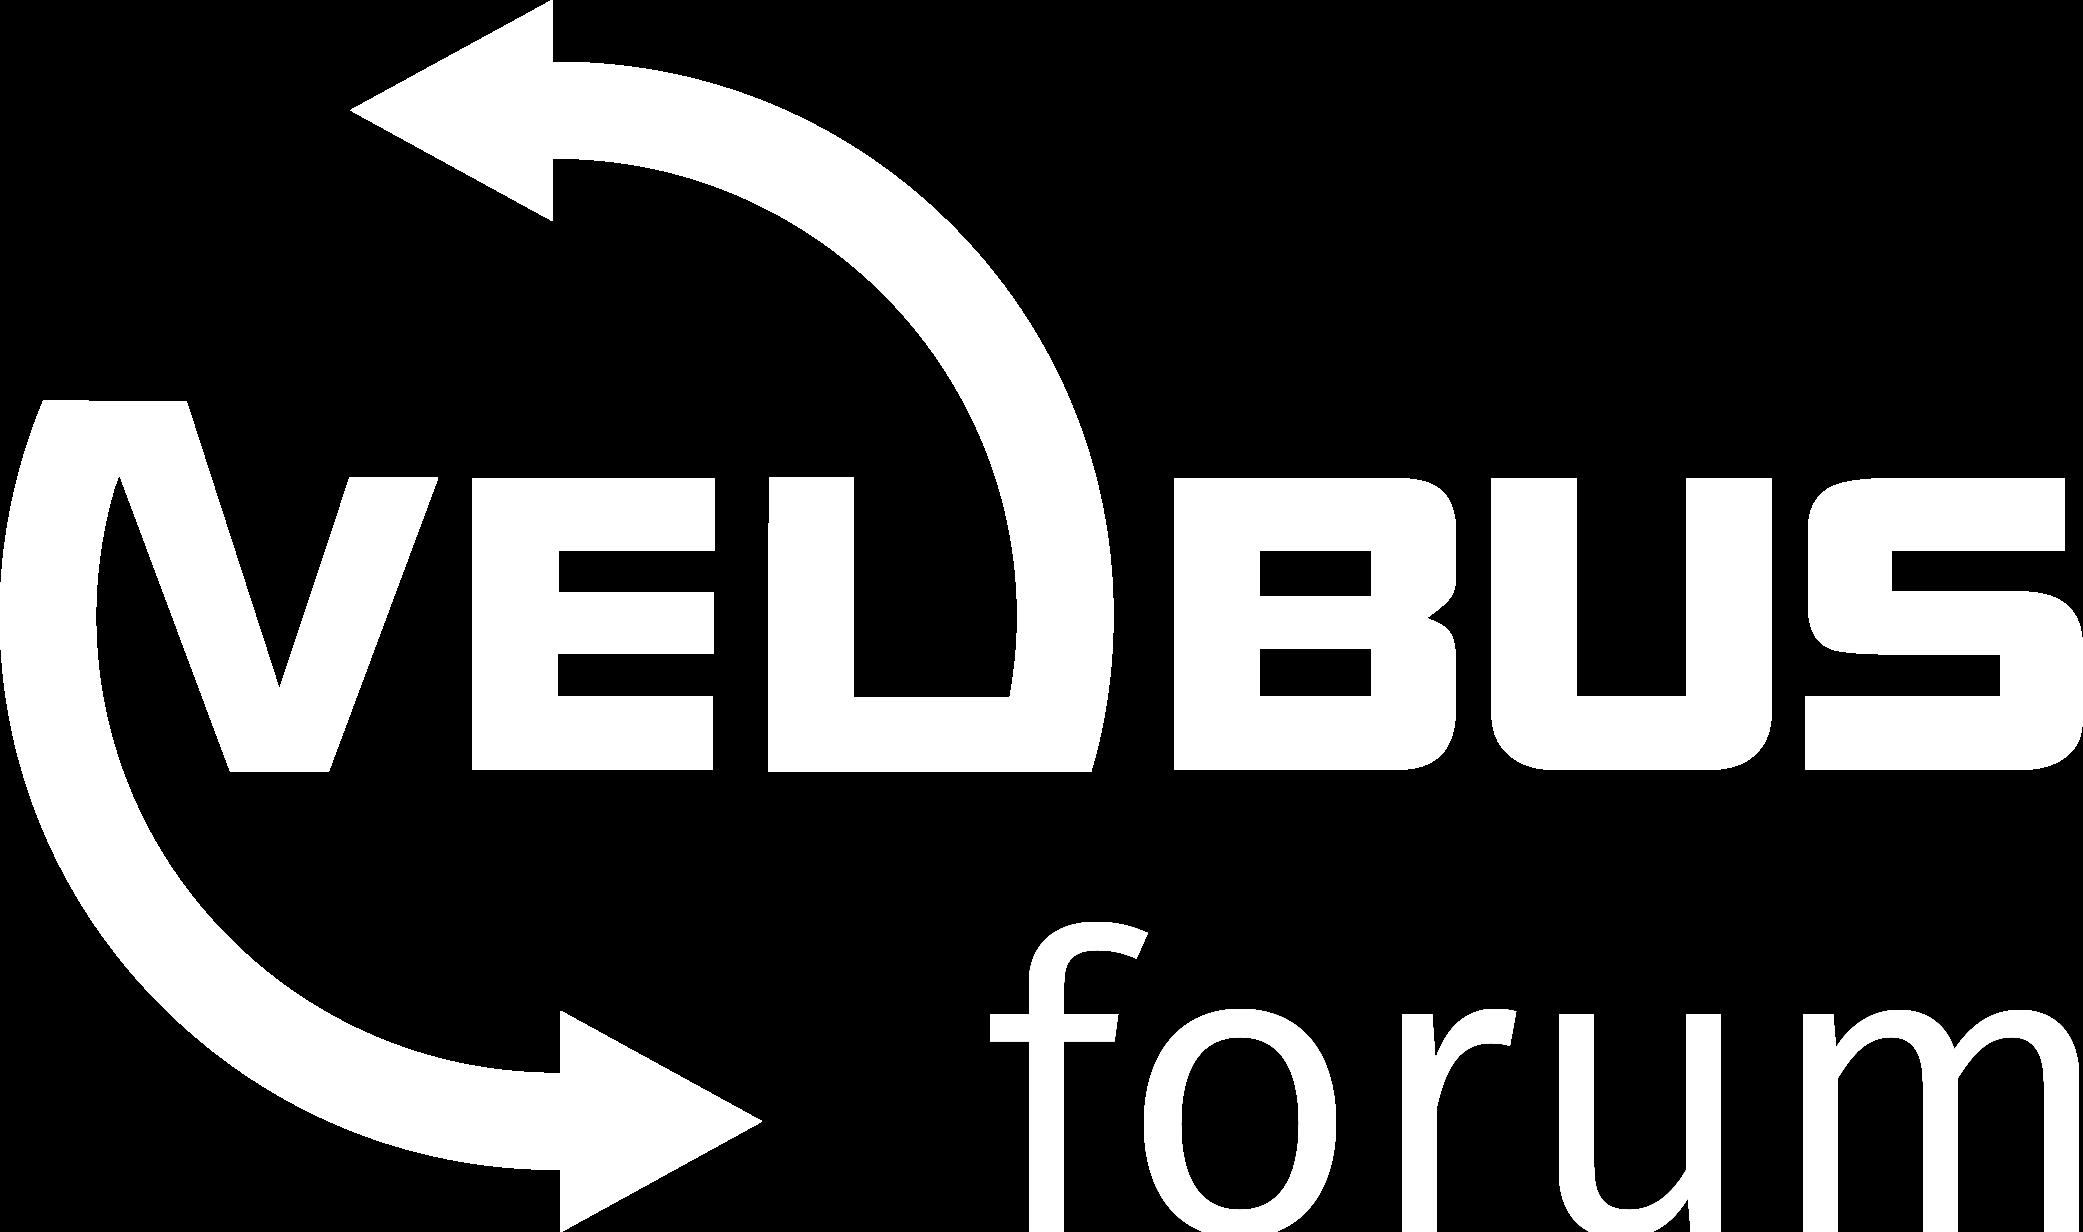 Velbus Forum